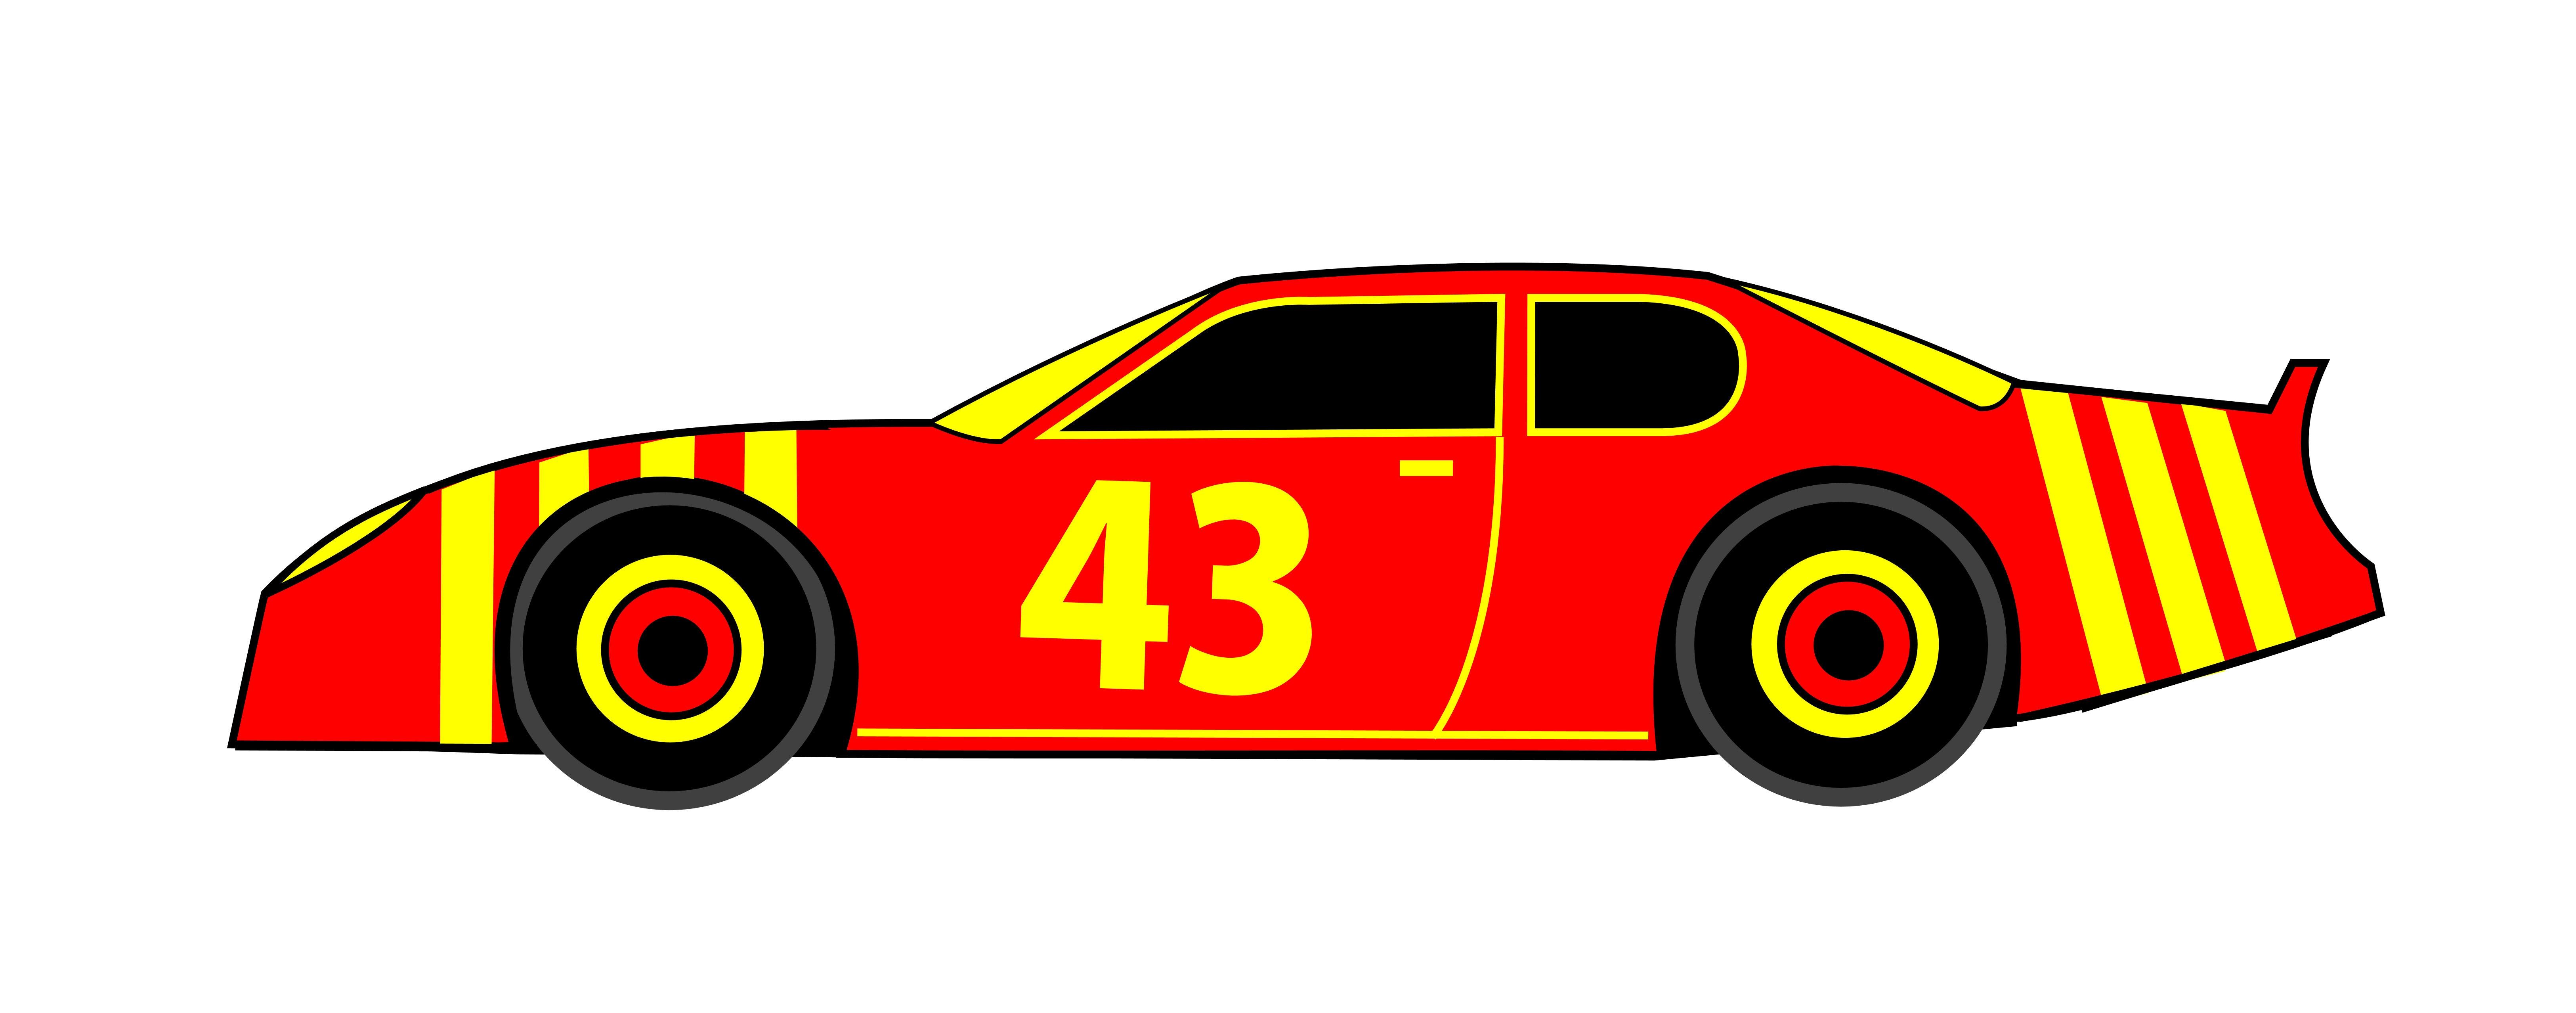 6500x2555 Racing Car Clipart